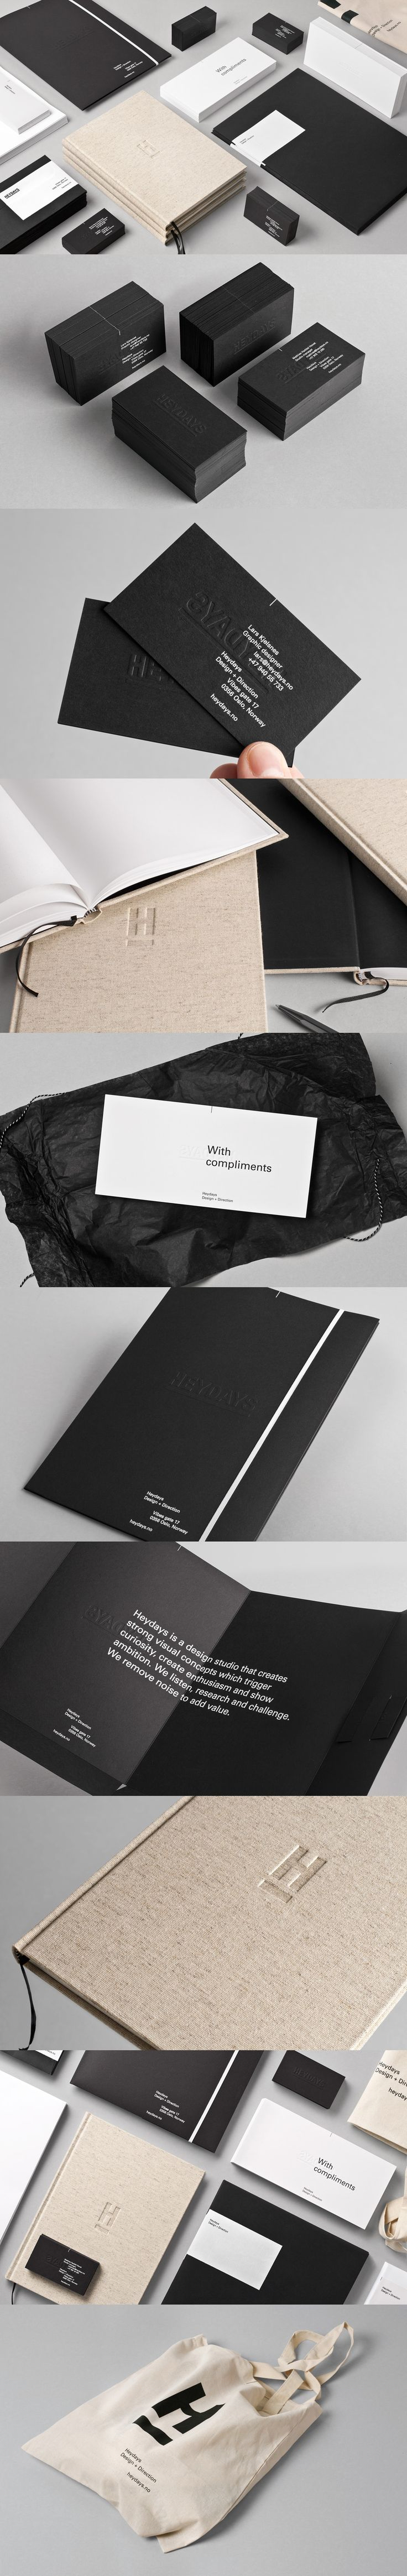 Unique Branding Design, Heydays #Branding #Design (http://www.pinterest.com/aldenchong/)